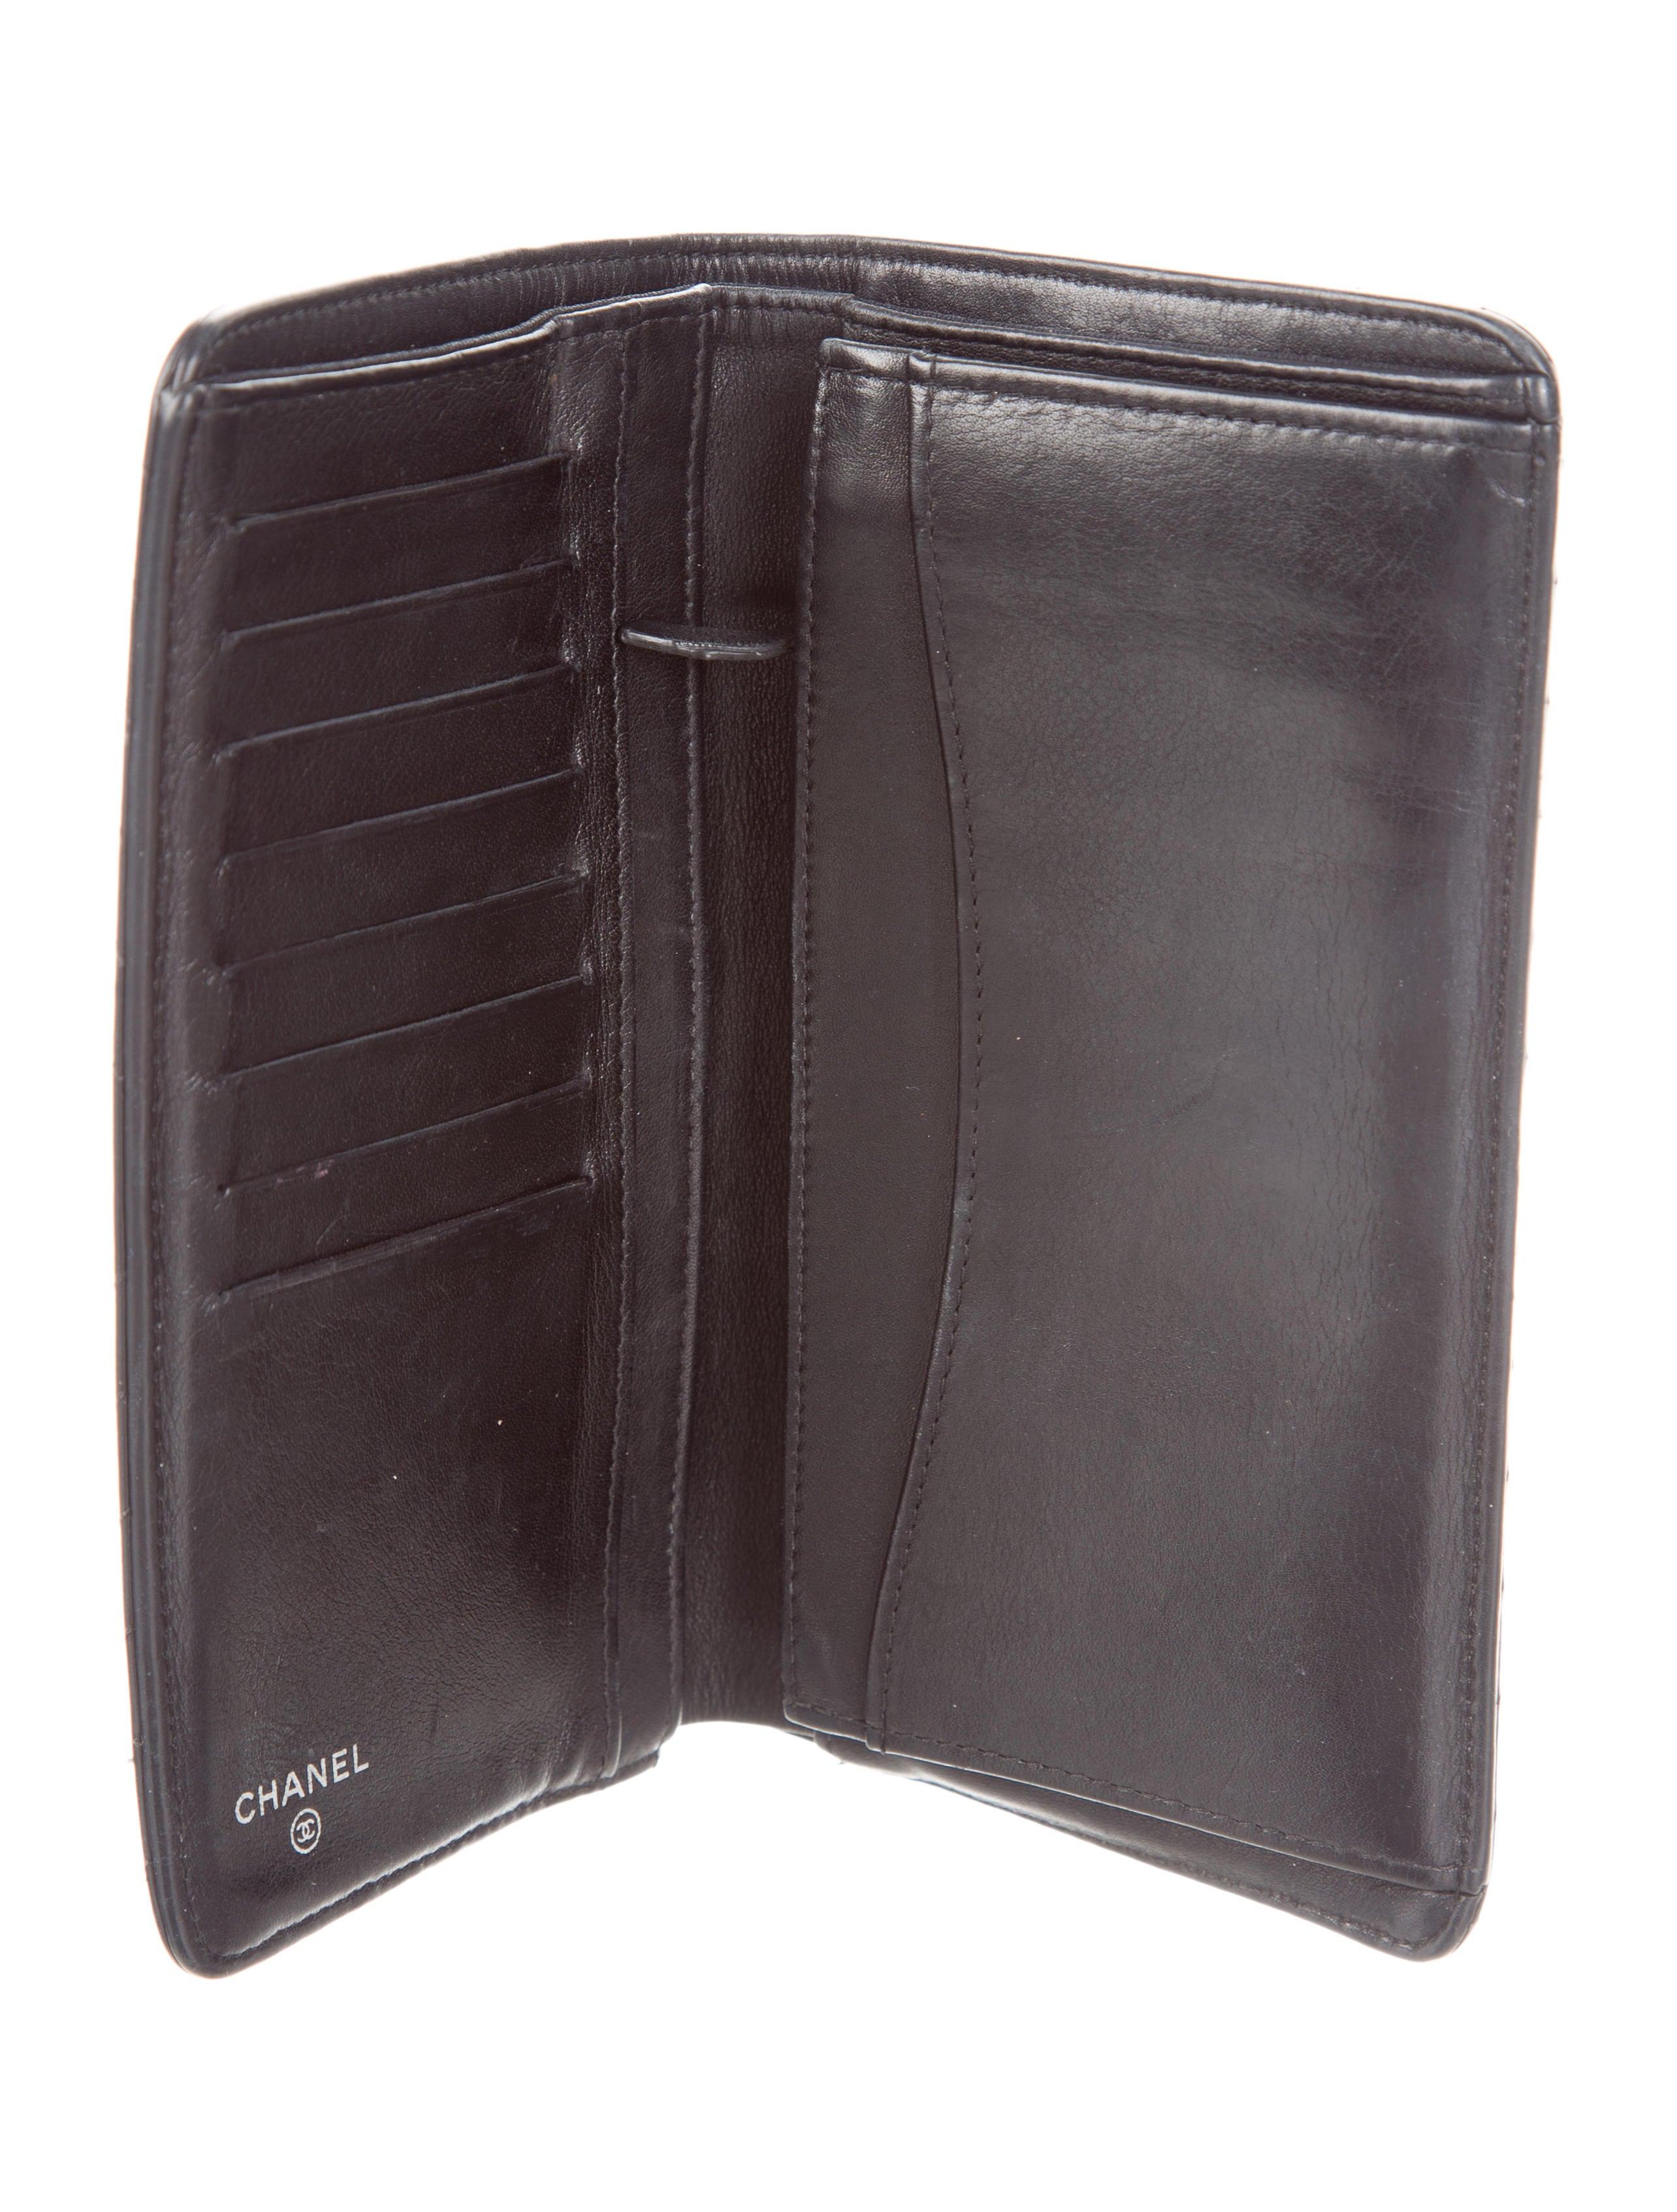 91a1d65e1995 Chanel Chevron Yen Wallet - Accessories - CHA214721 | The RealReal